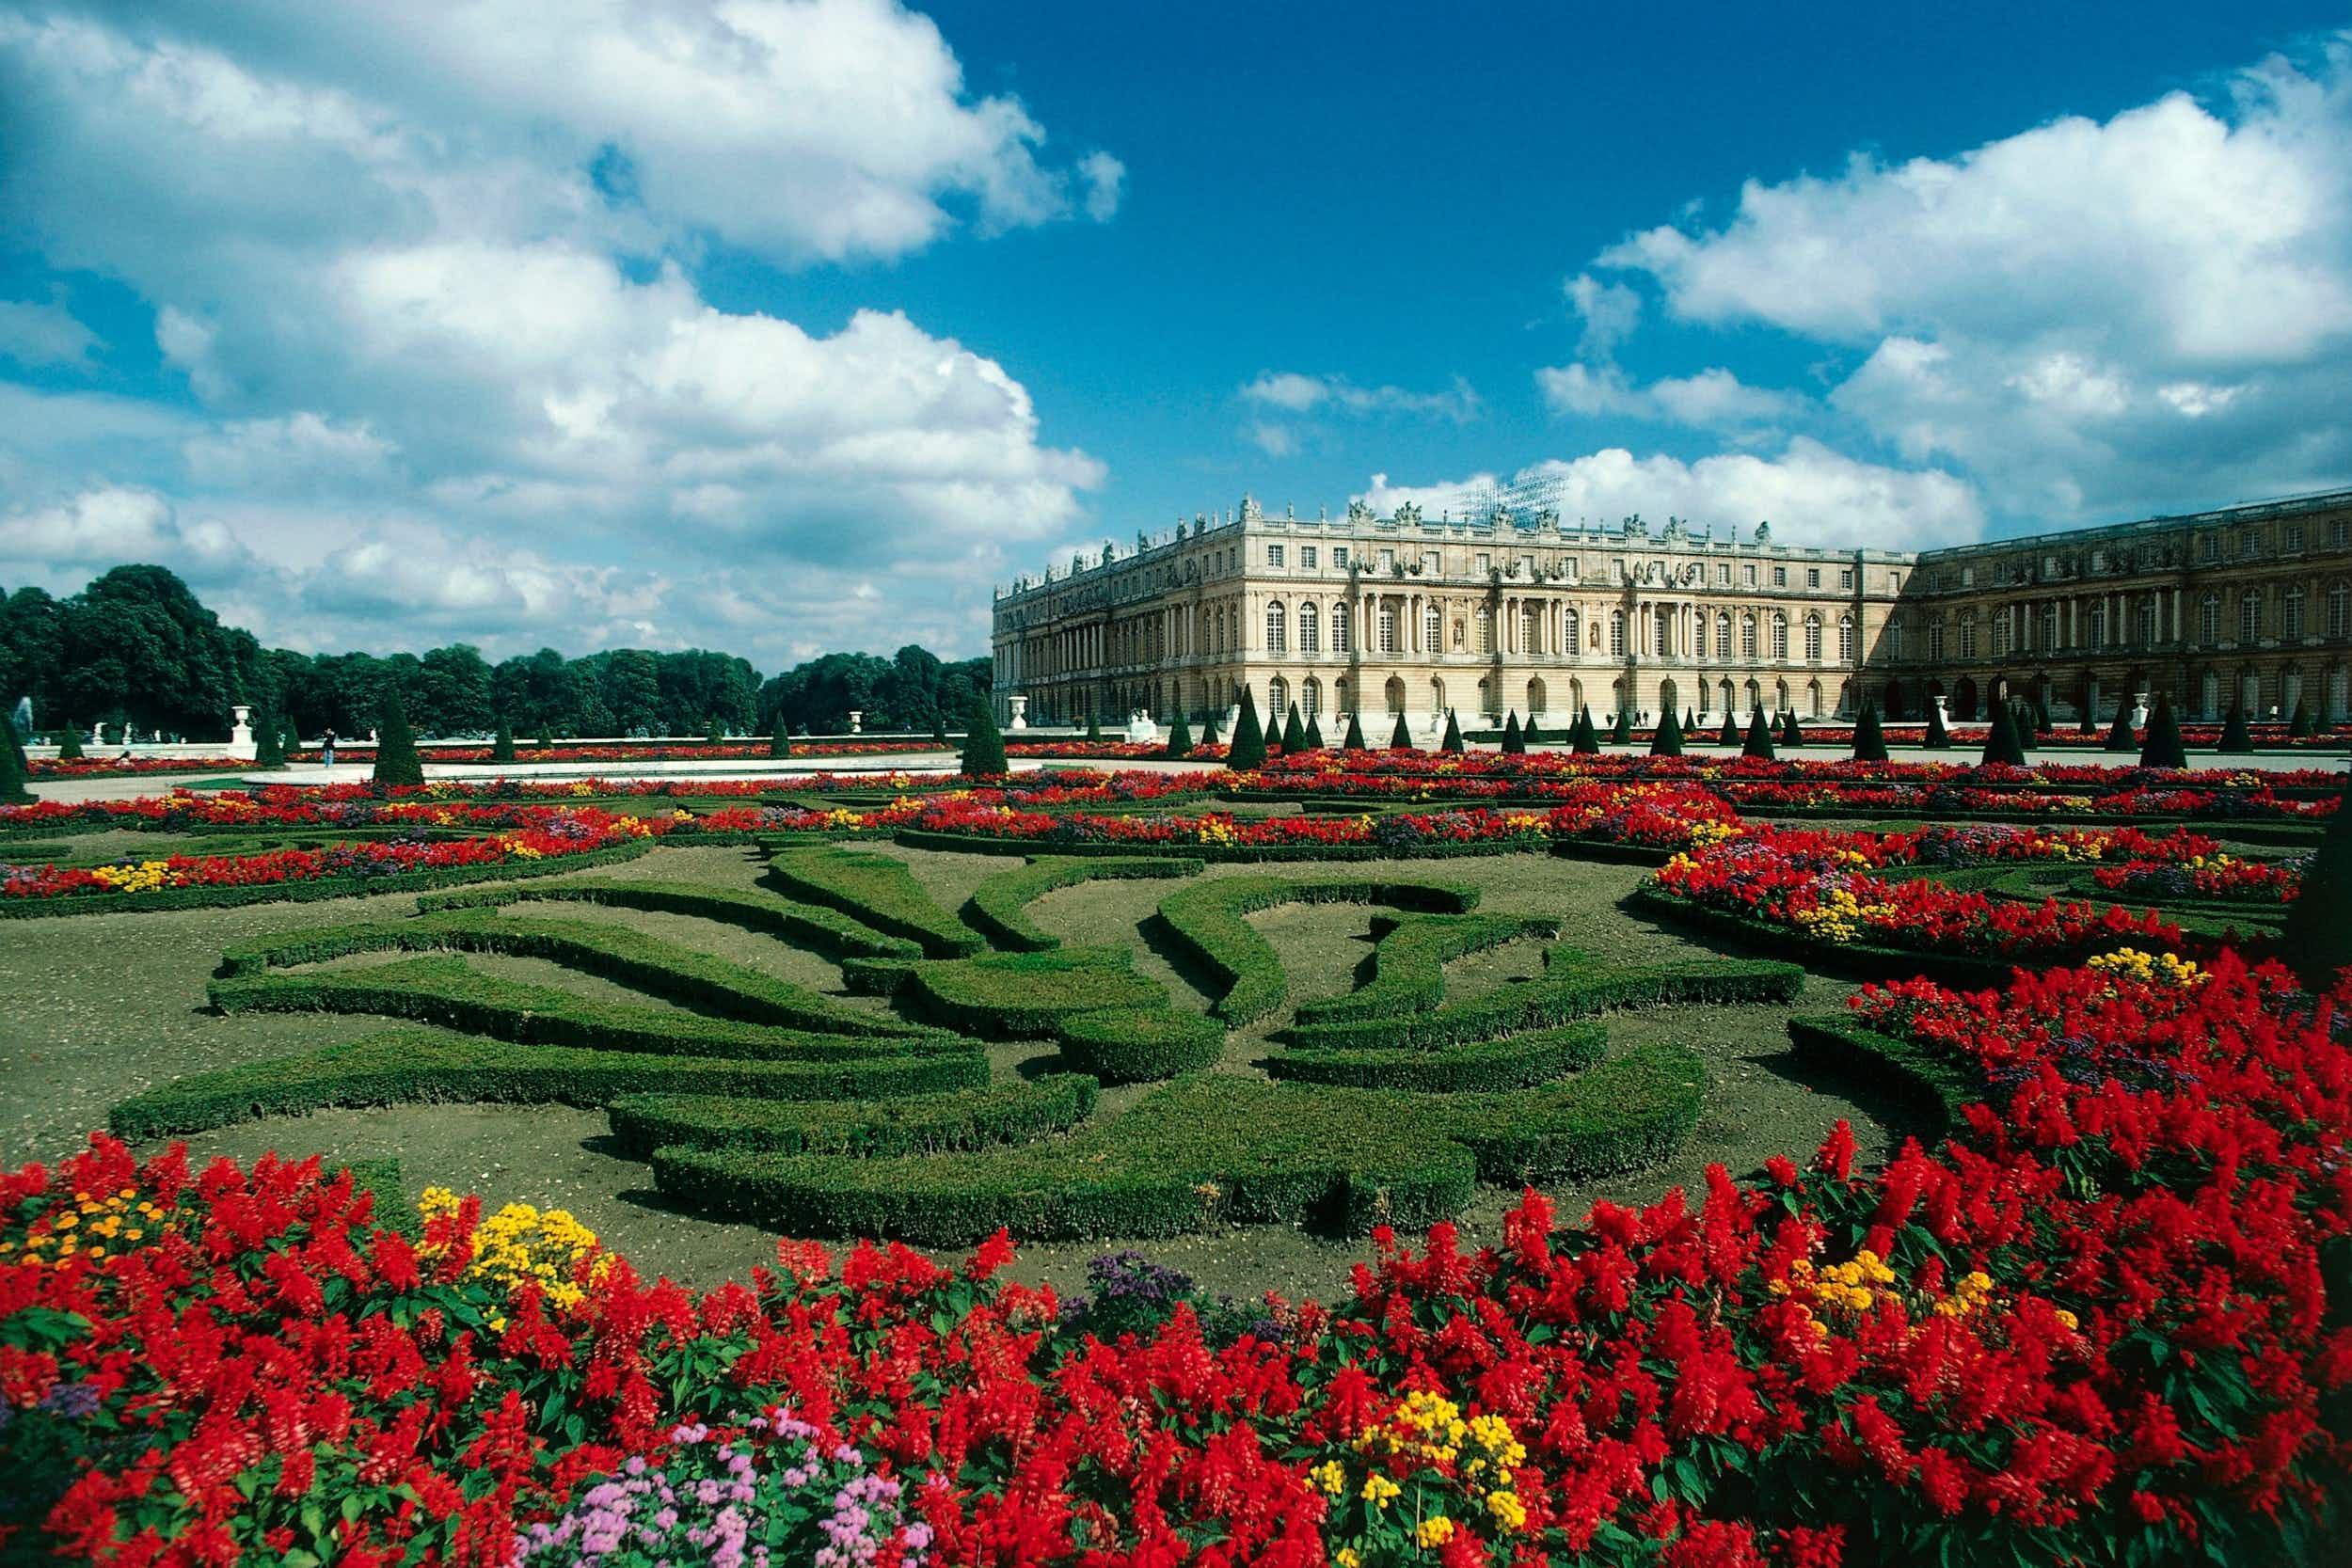 You can explore Château de Versailles by virtual reality © Dea / G. Sioen/ Getty Images